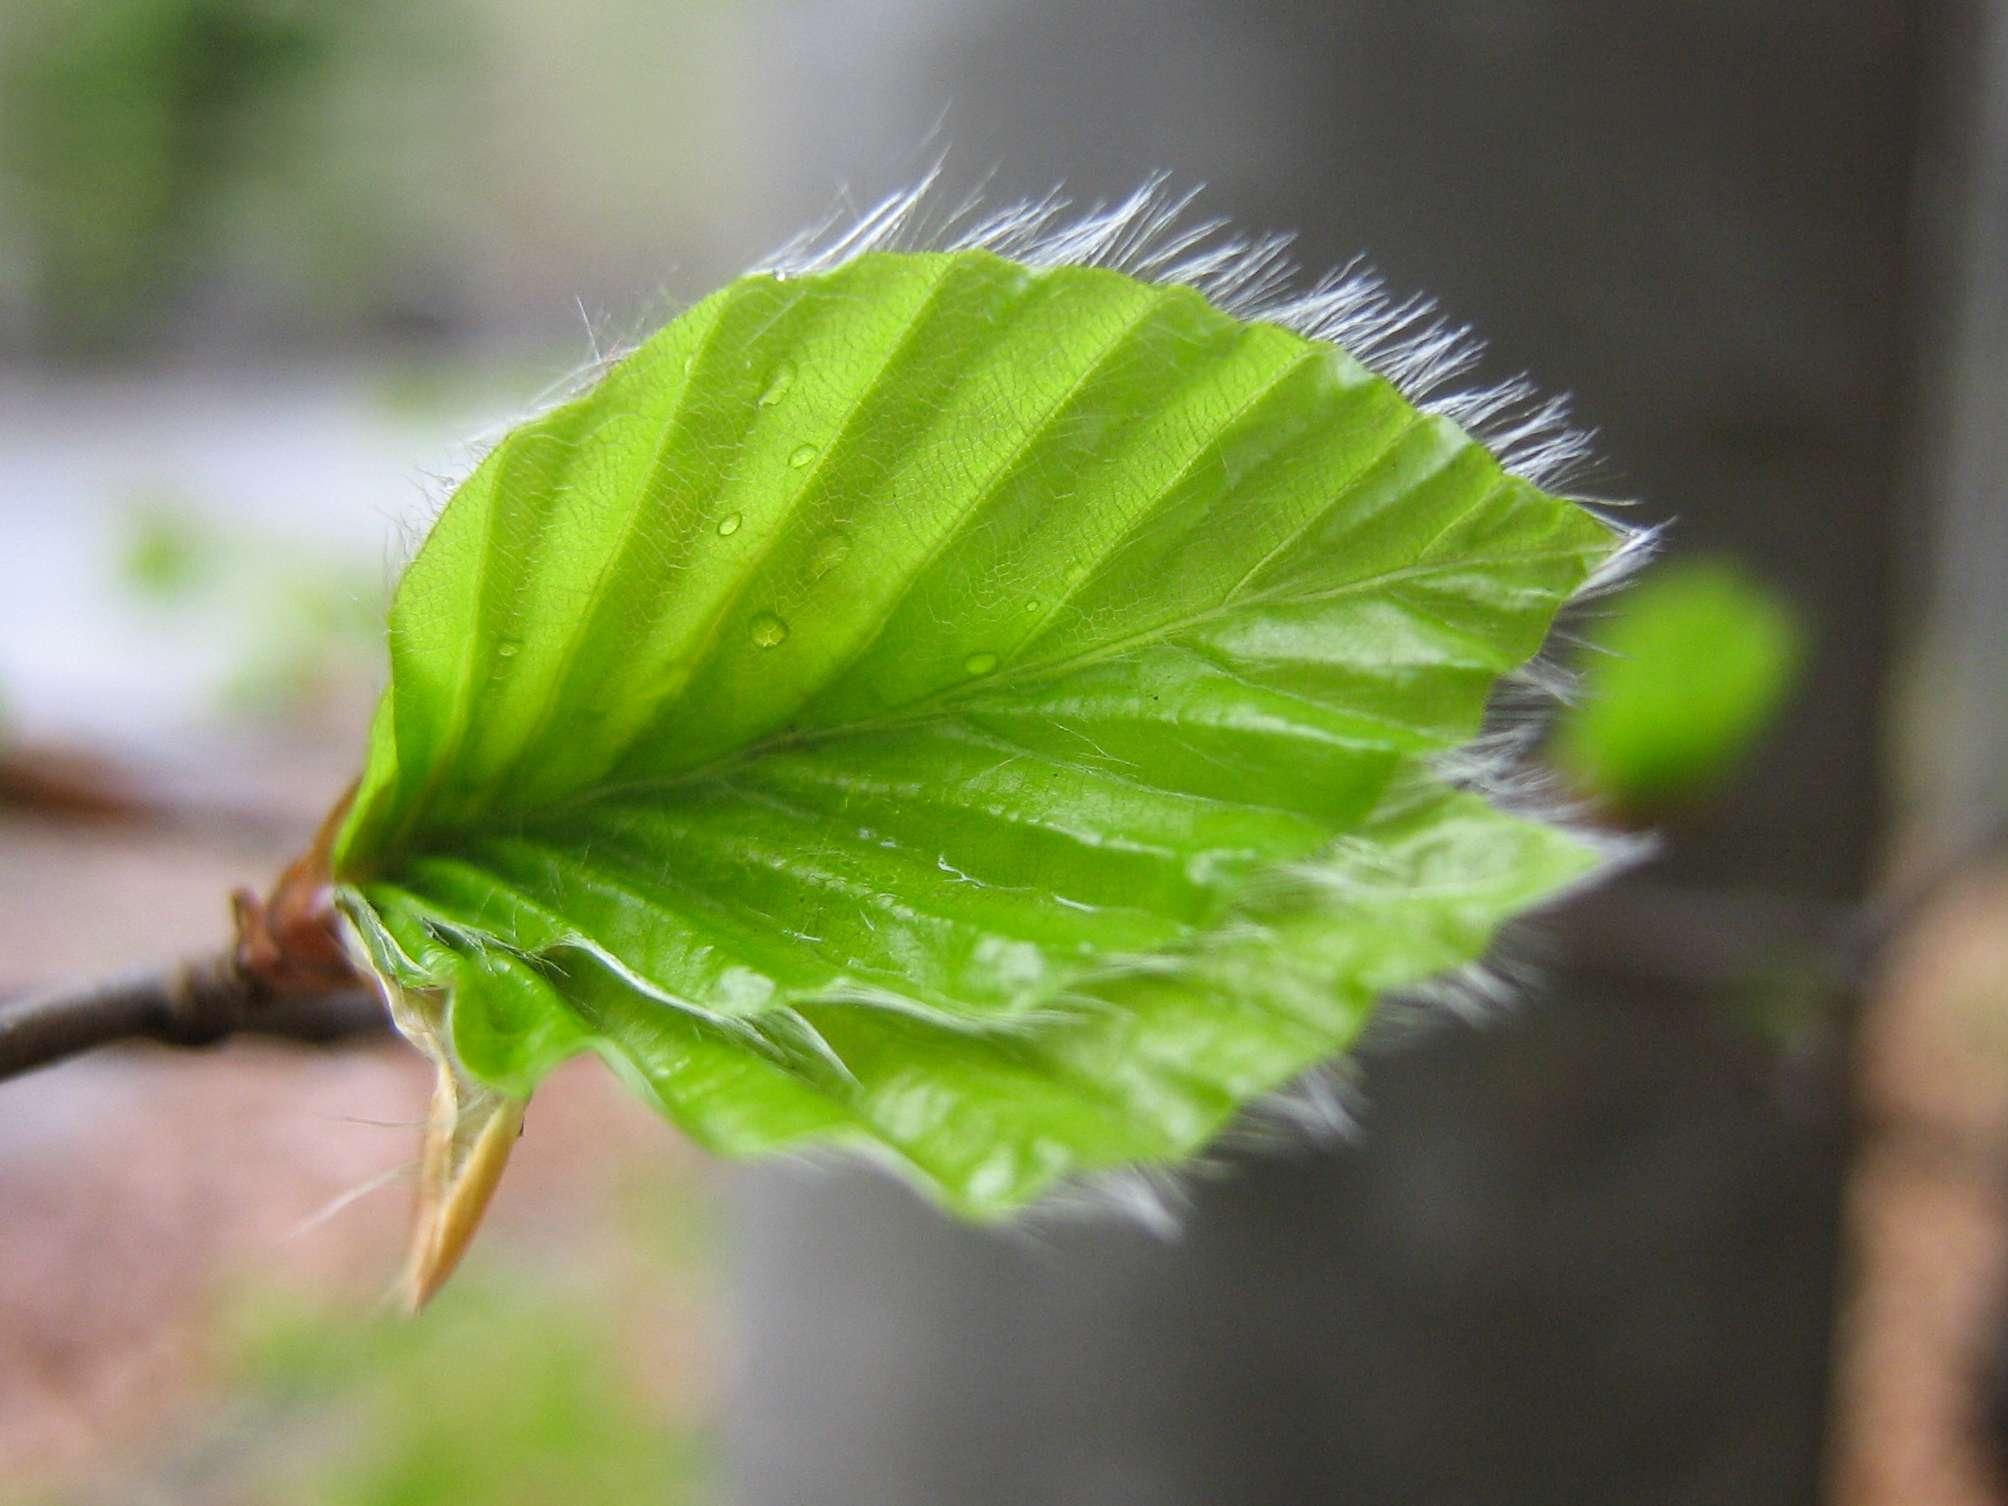 closeup macro shot of green leaf with furry white trim